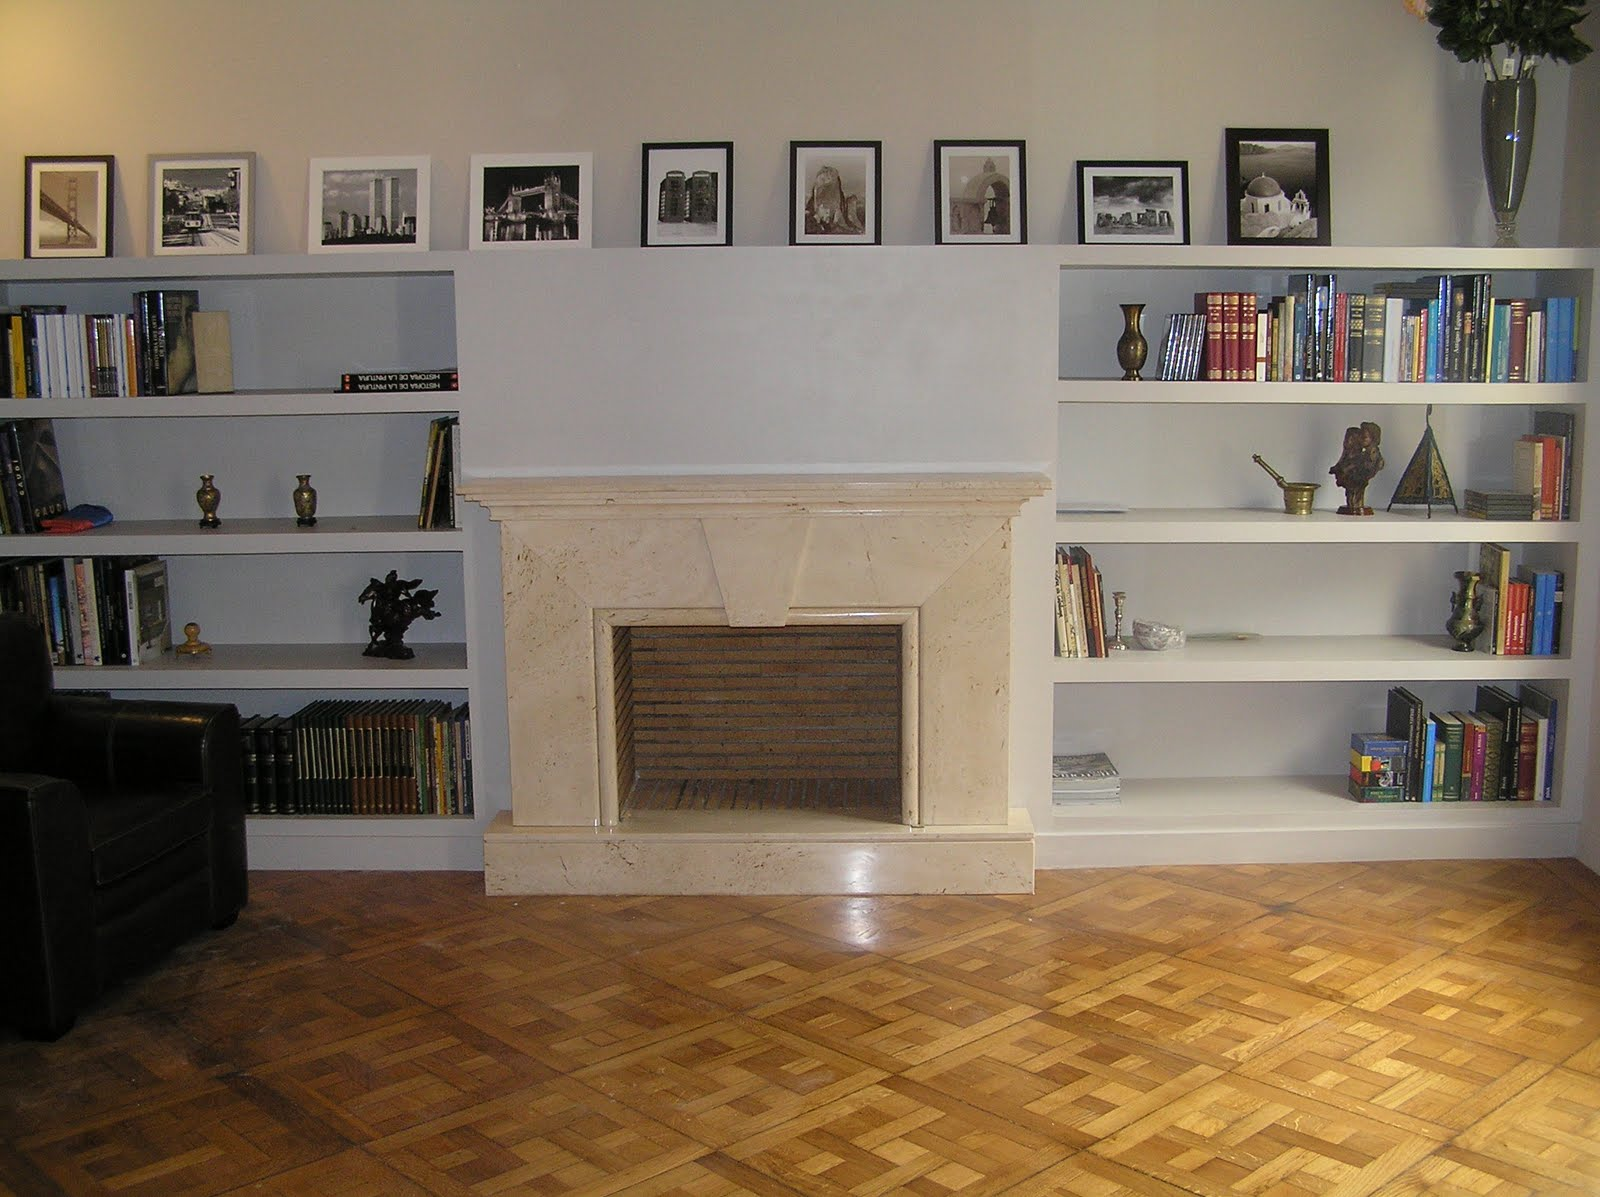 Reformas barcelona stanley 698 372 093 mueble de pladur - Muebles de pladur para salon ...